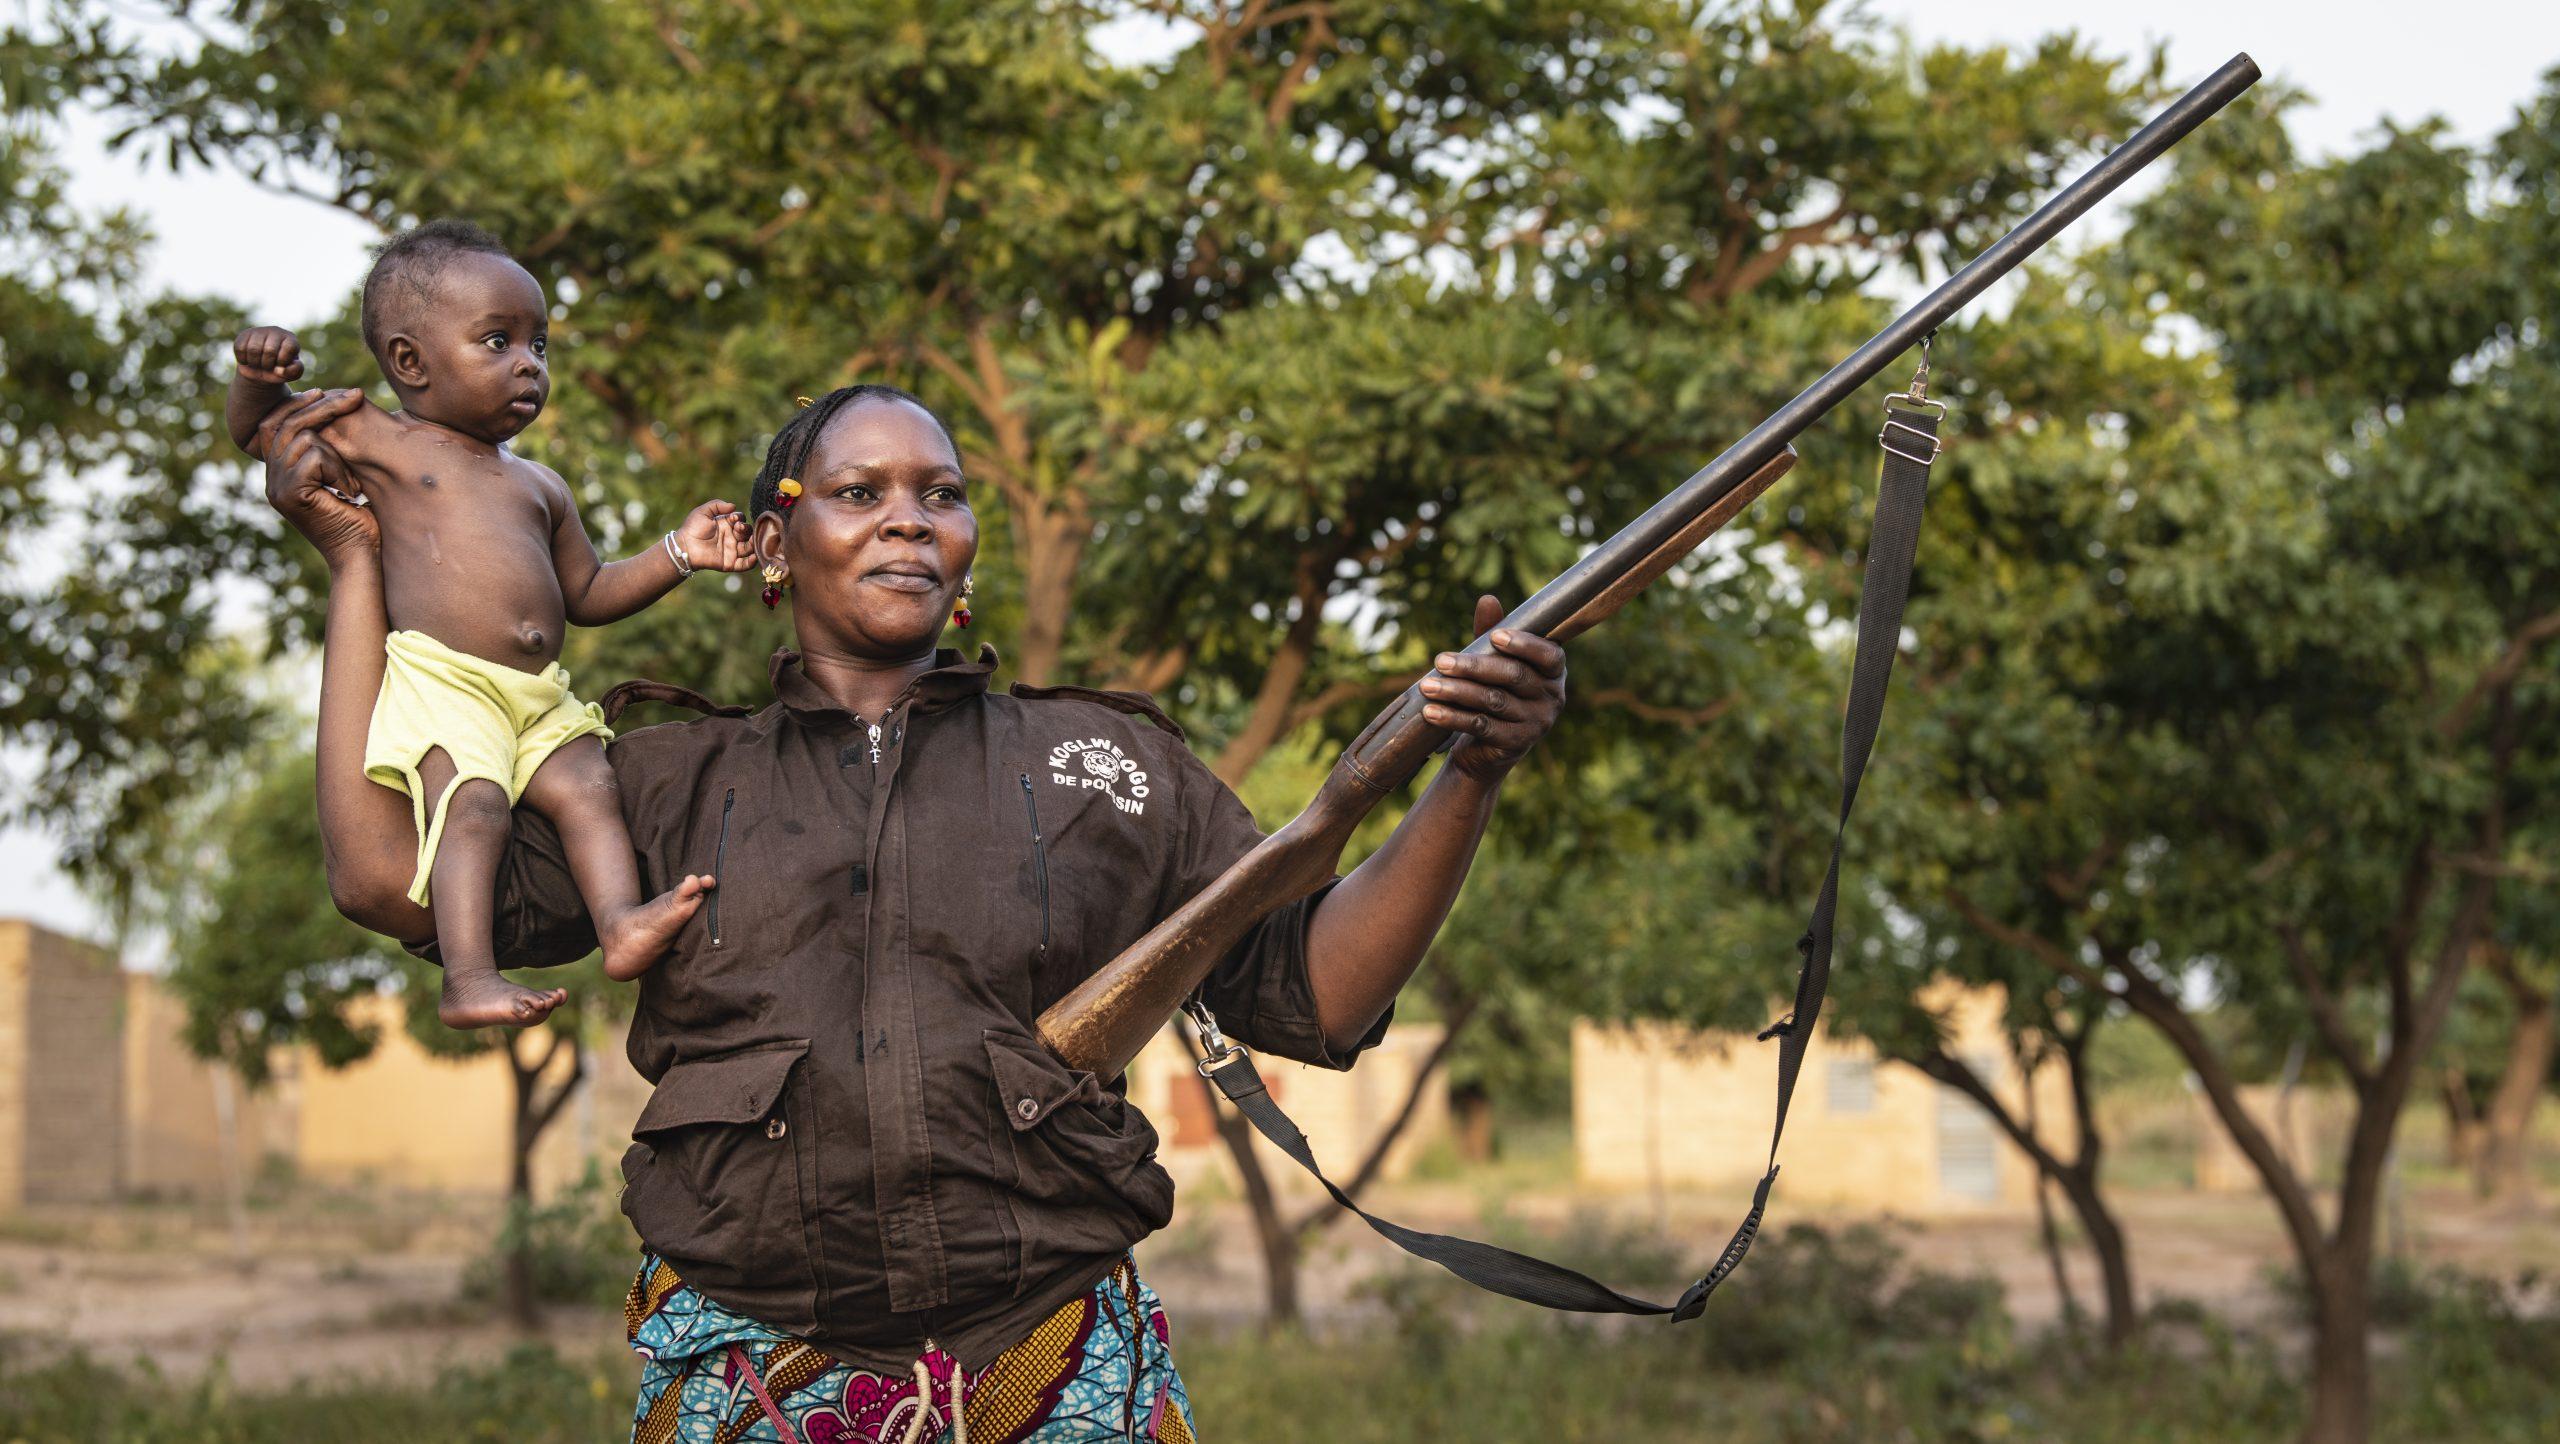 Bringing Burkina Faso to its knees